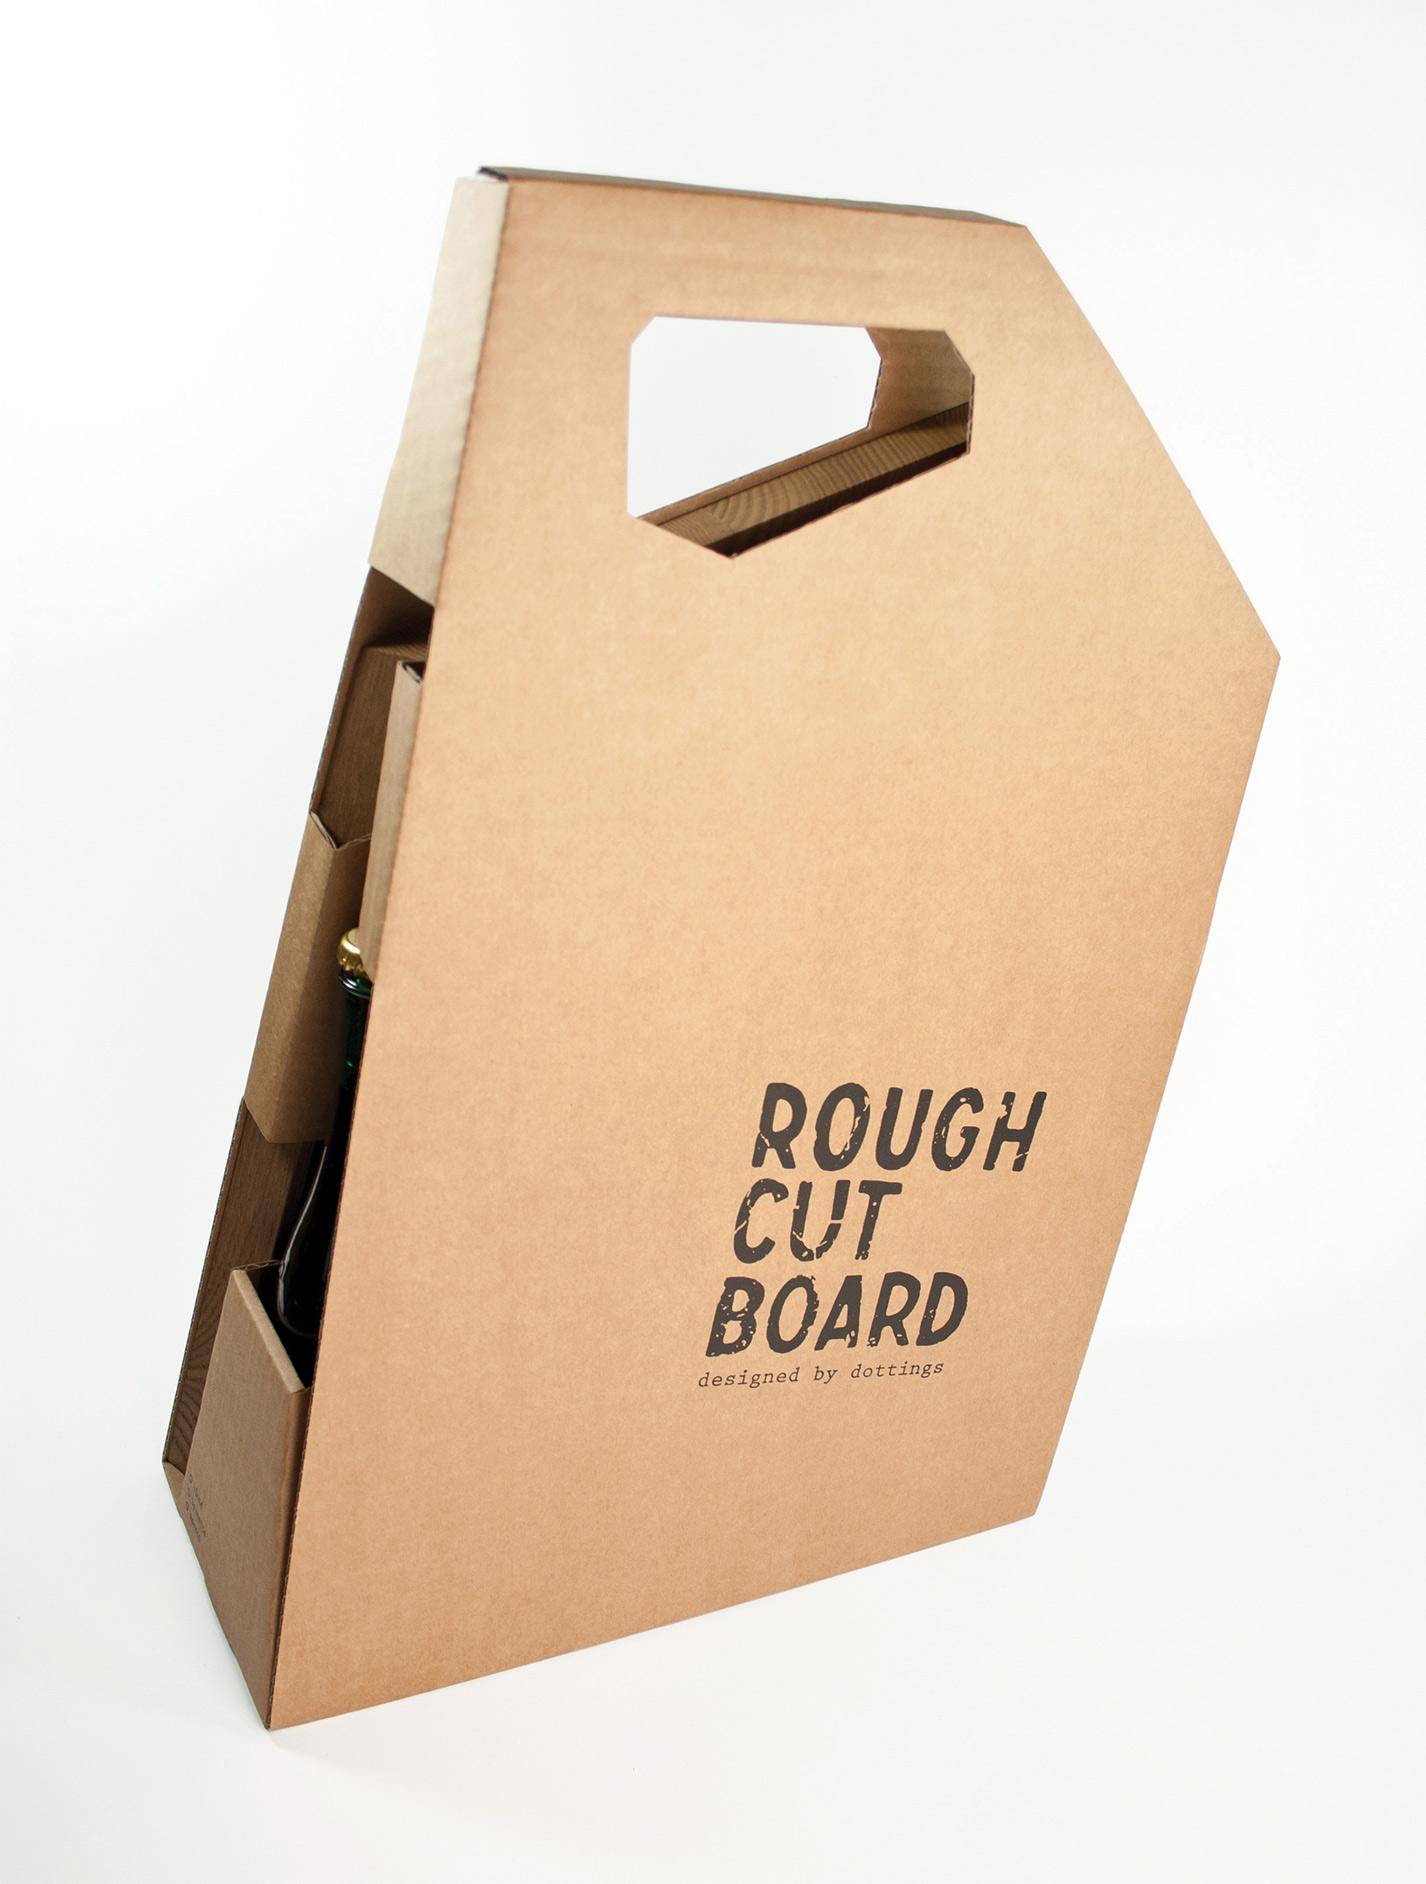 roughcutboard tragbare Picknick Wellpappe Box